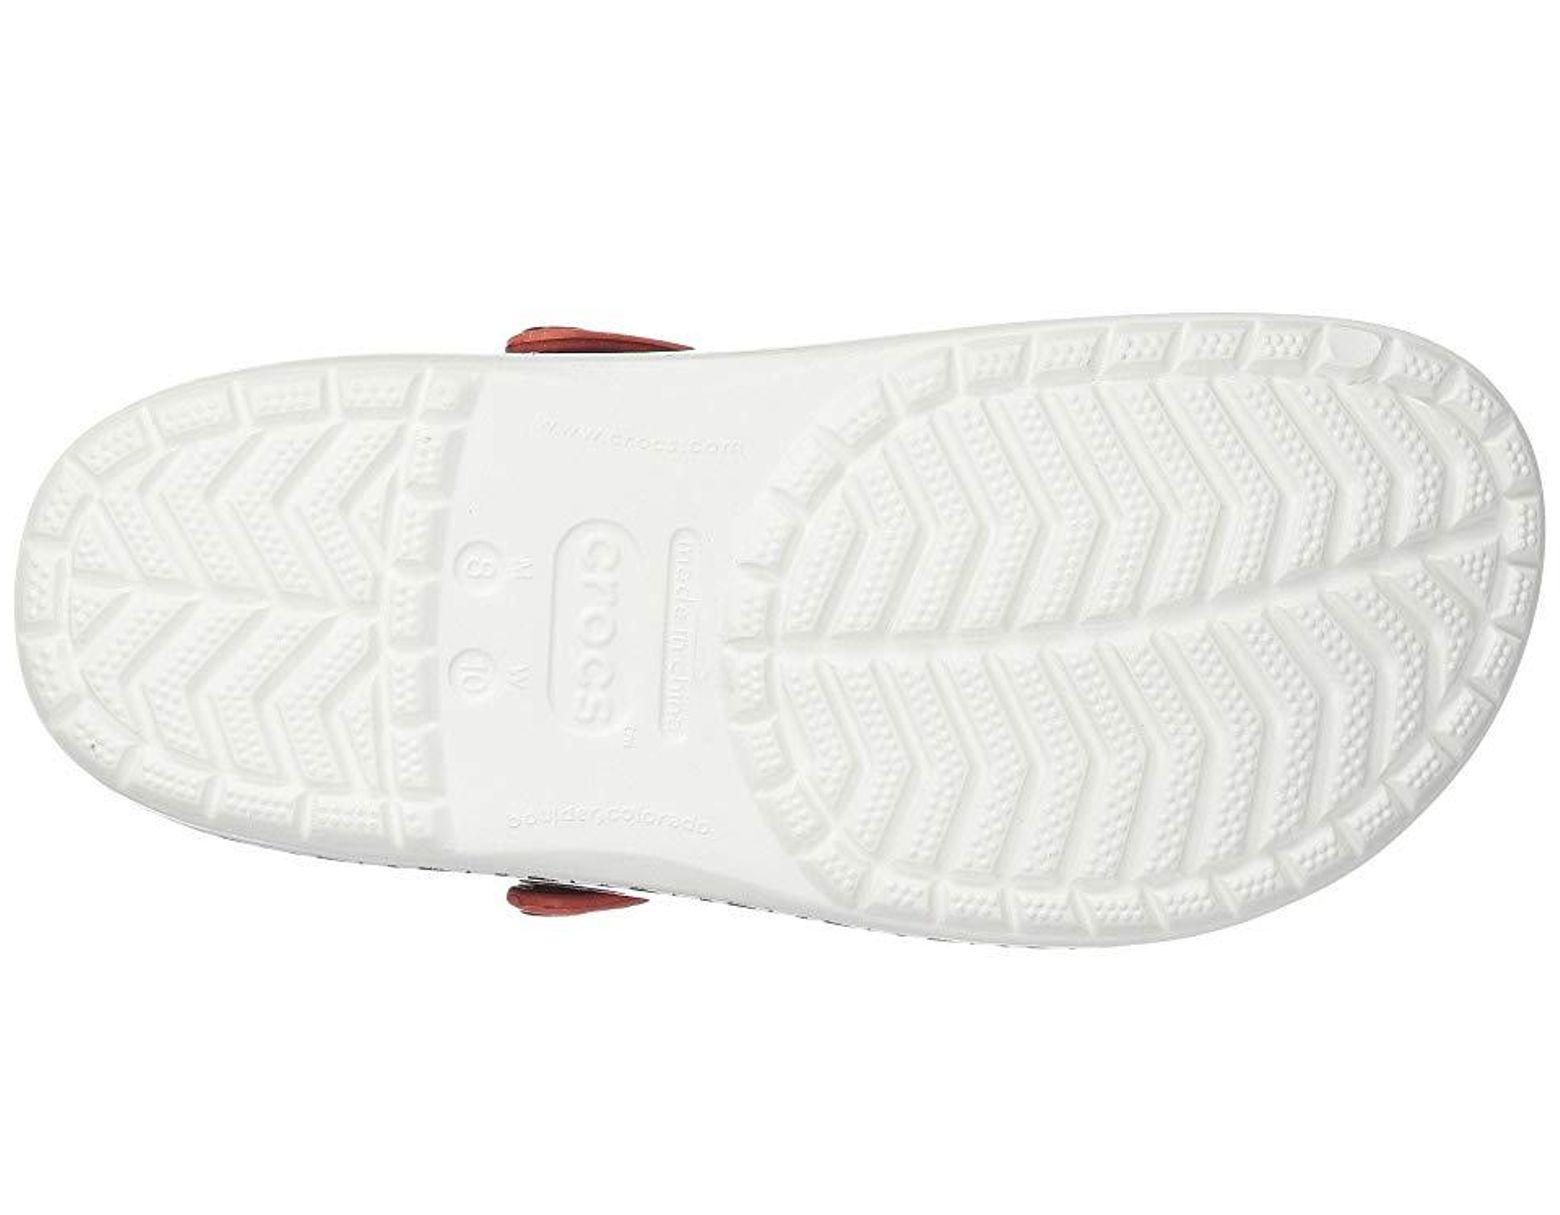 d03afca274016 Crocs™ Drew X Crocband Chevron Clog (black/white) Shoes in Black - Save 10%  - Lyst